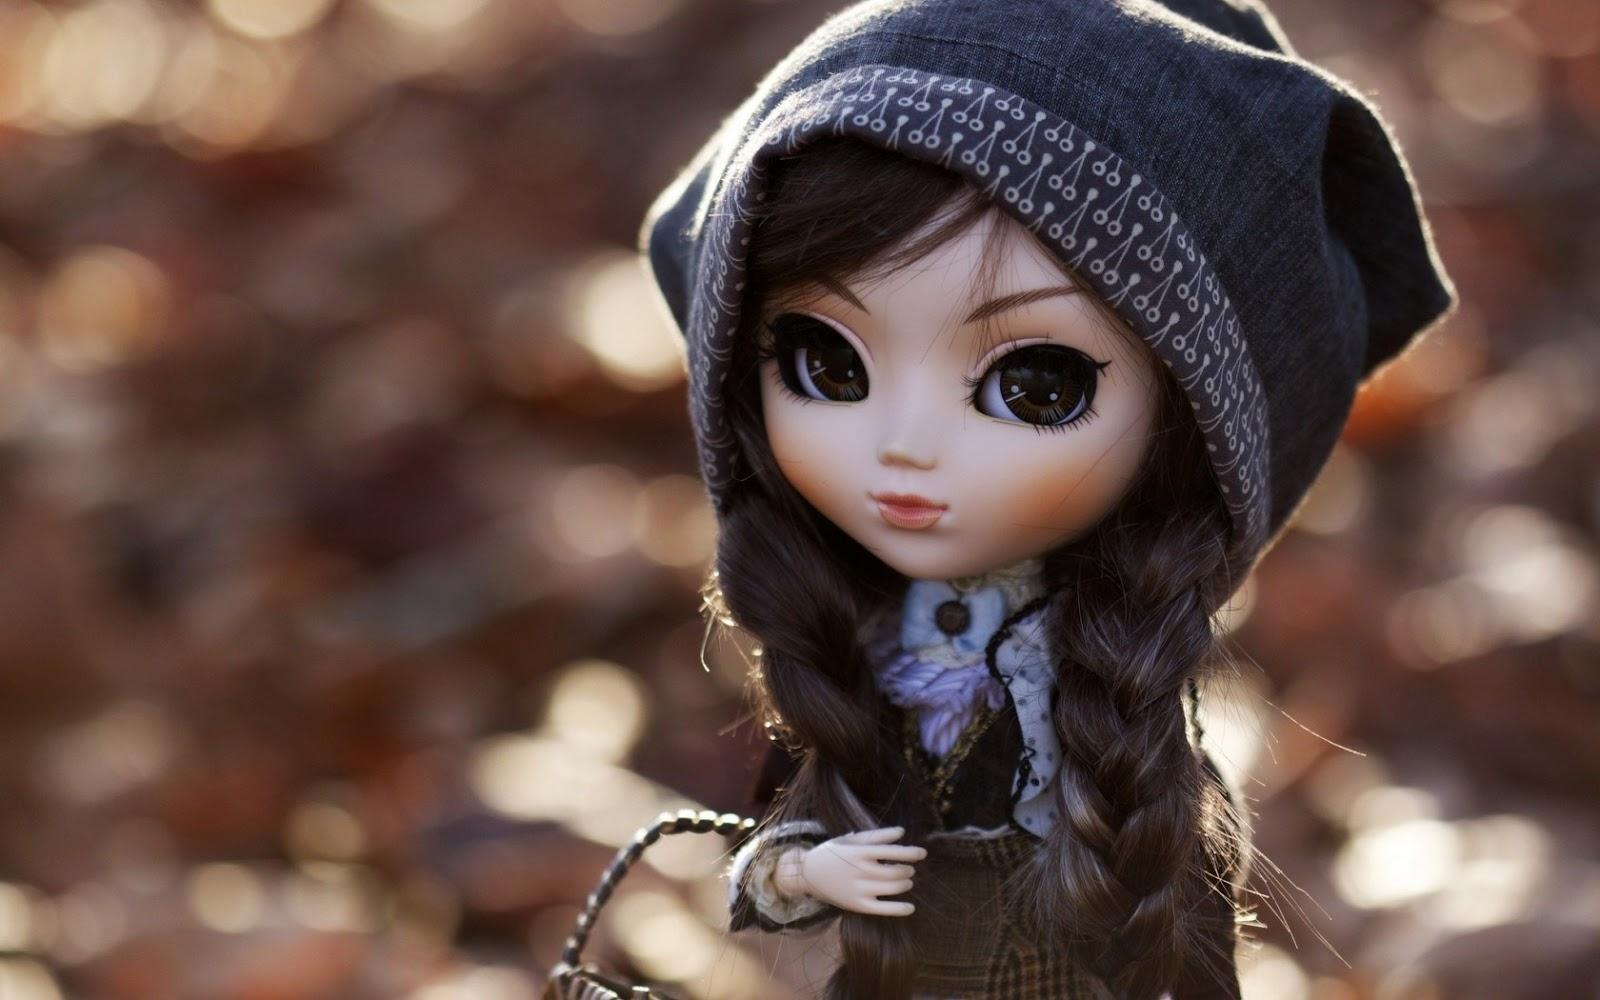 barbie dolls girl hd wallpapers whatsapp dp and fb